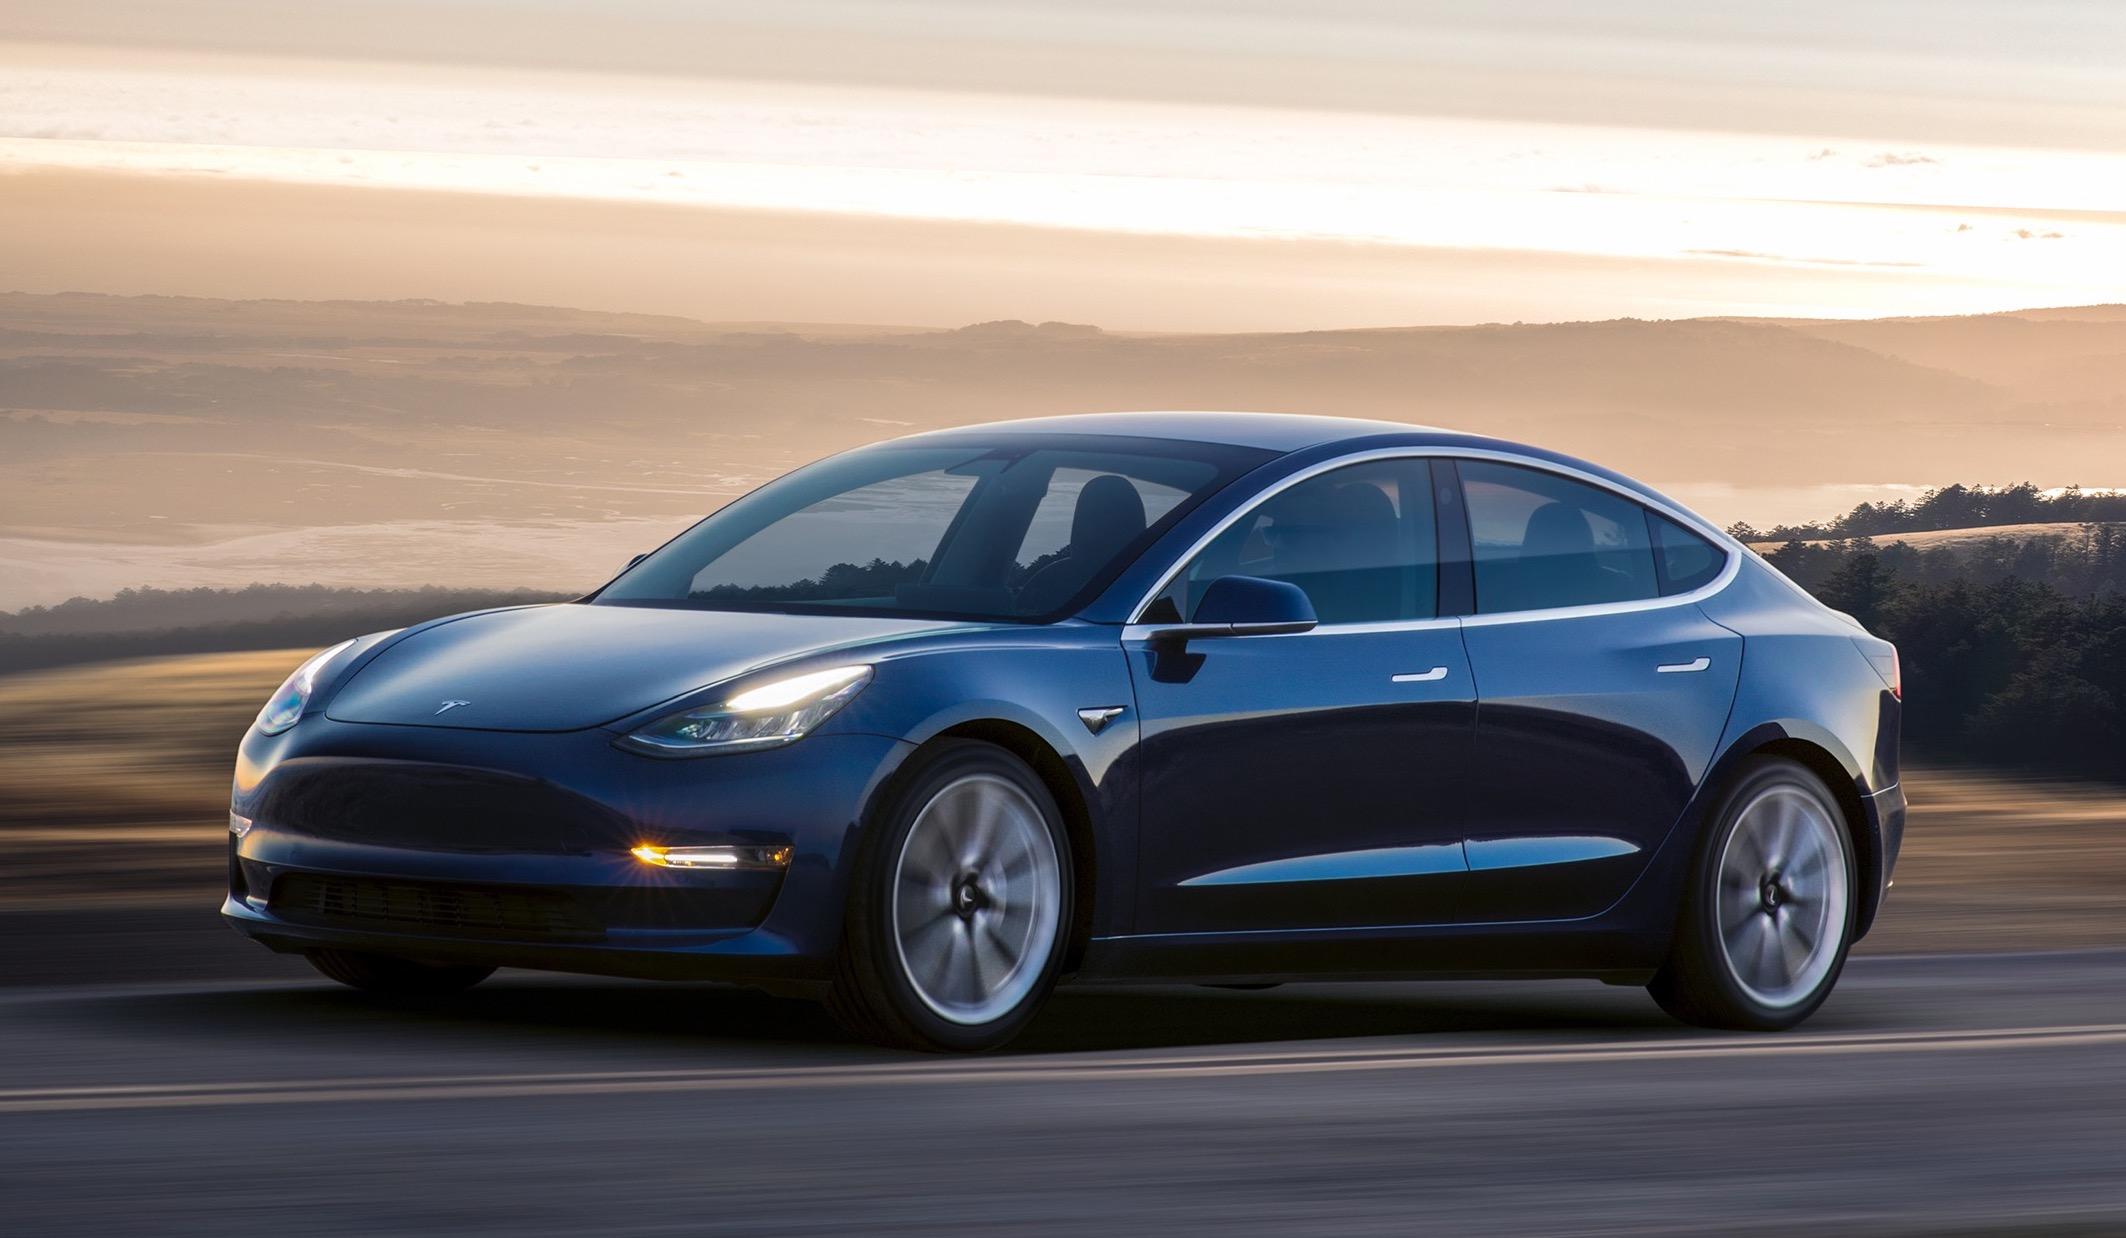 A blue Tesla Model 3 sedan.